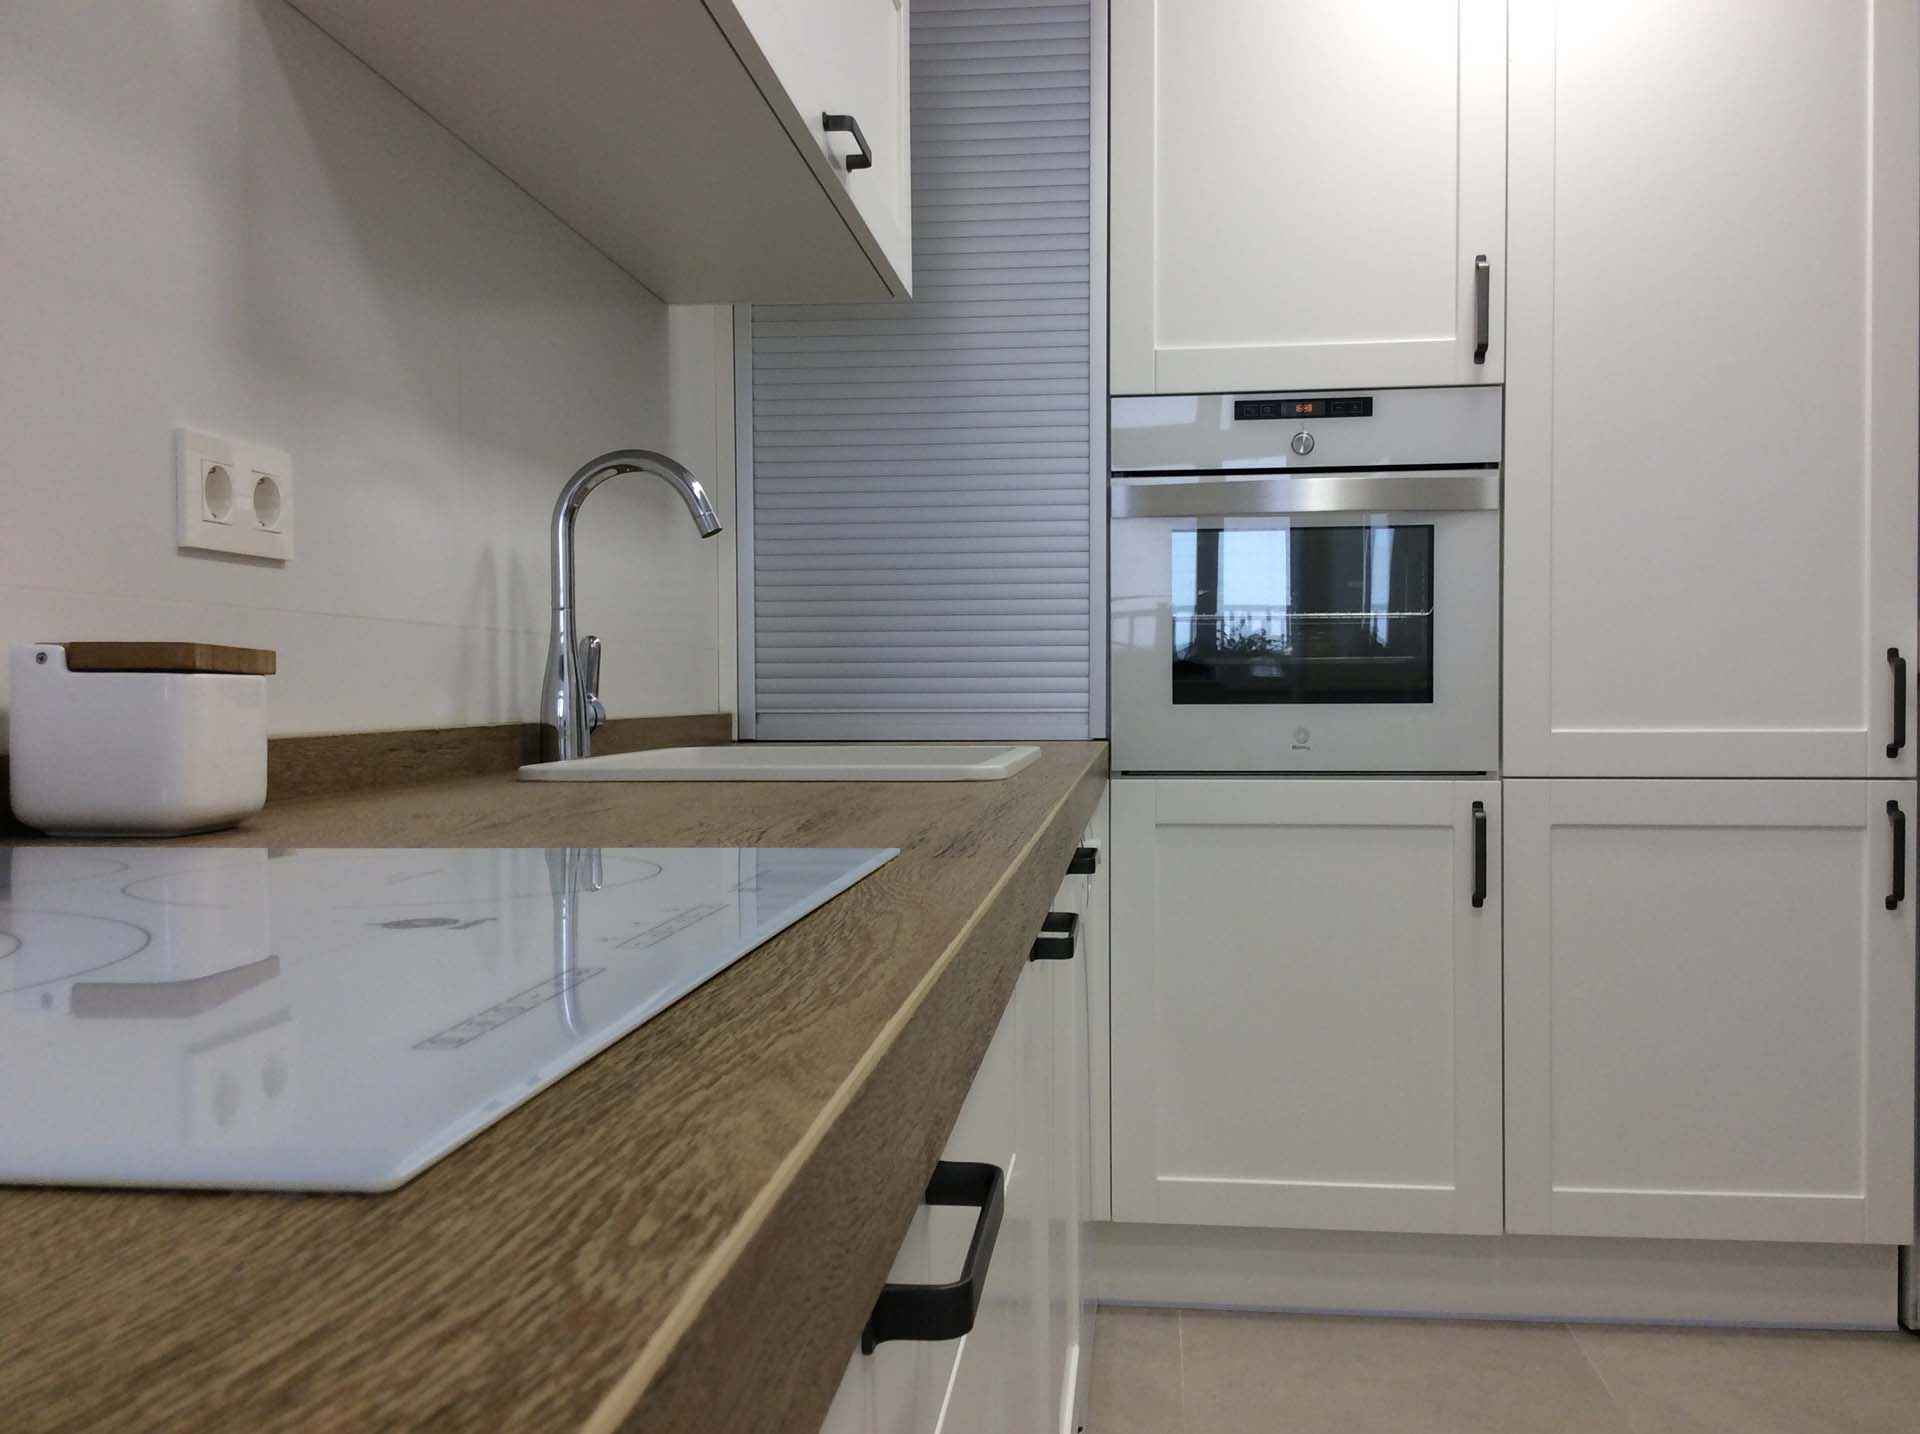 cocina blanca enmarcada persiana